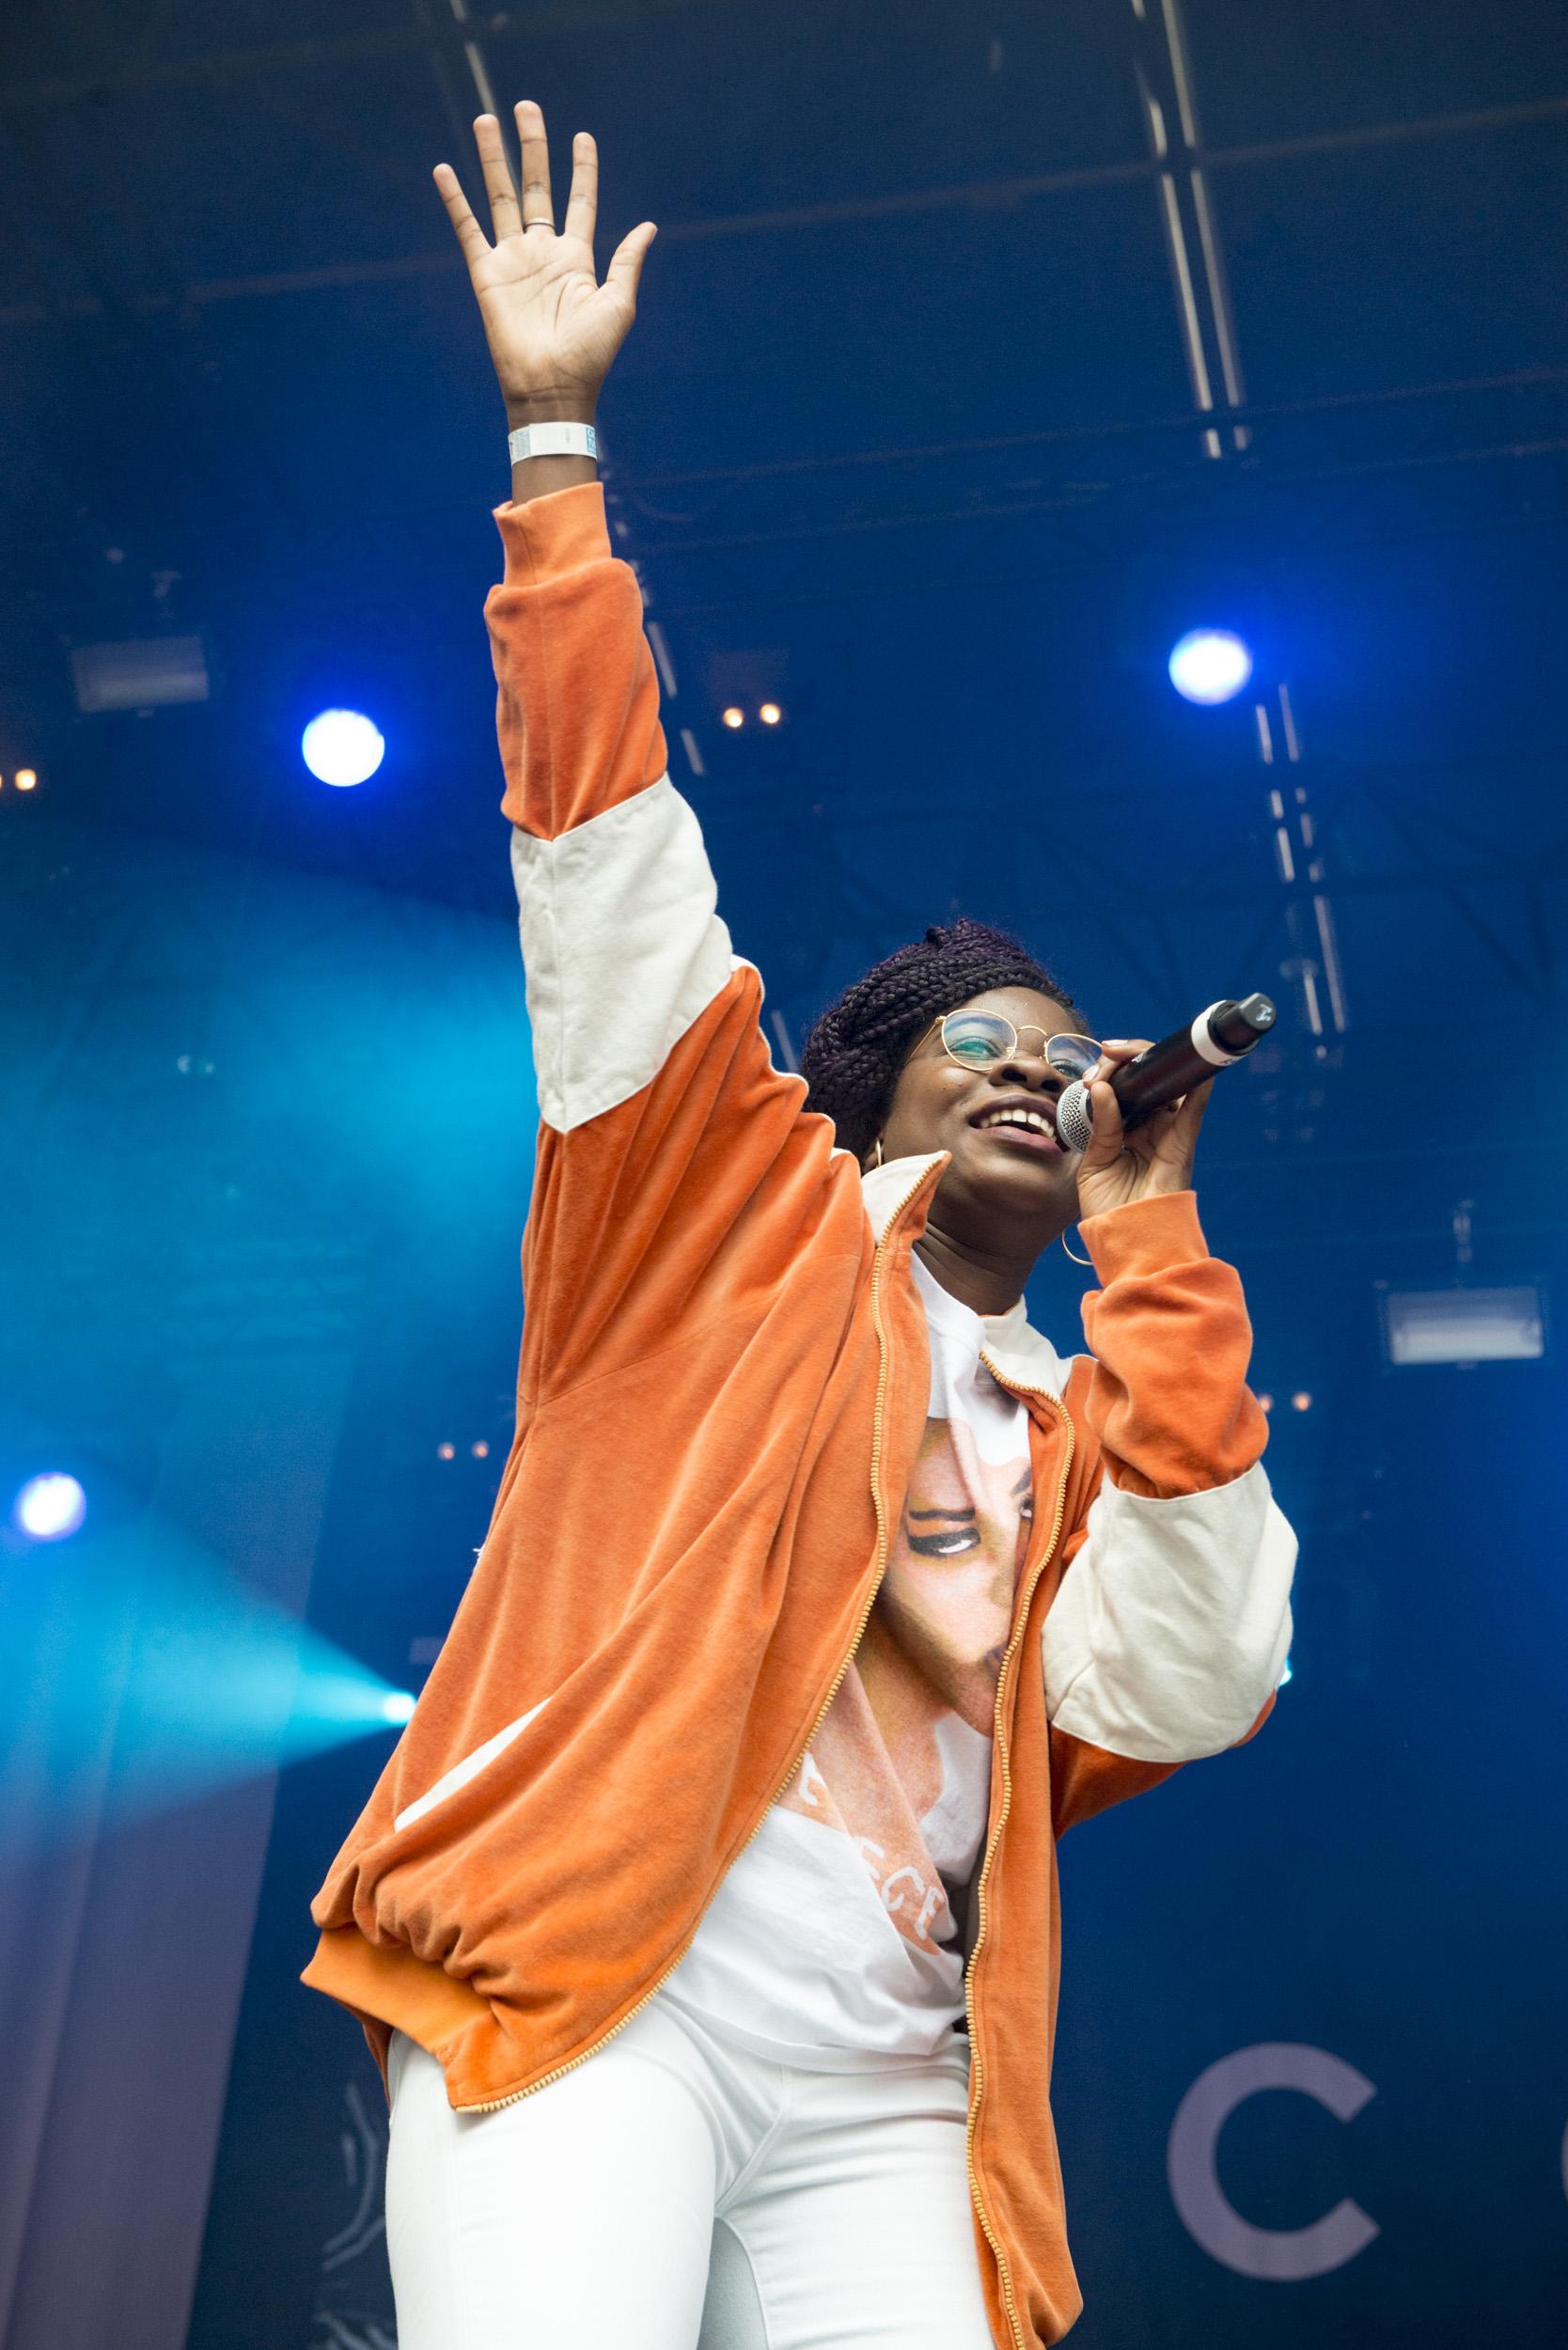 Coely @ Cactusfestival 2017, Dag 2 (Nick De Baerdemaeker)